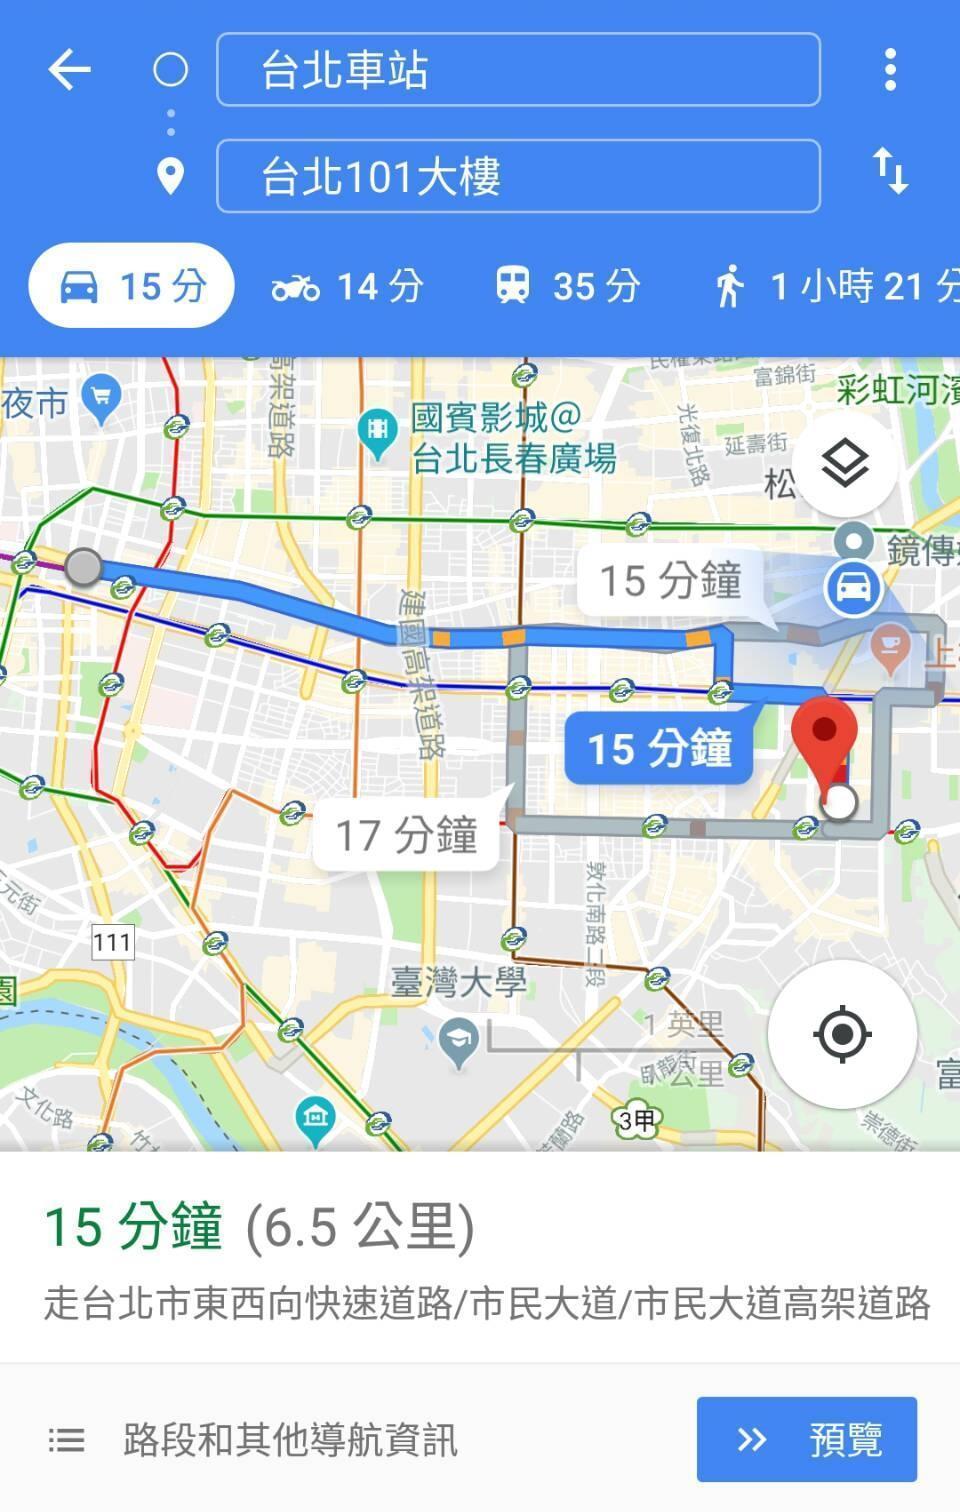 Google地圖汽車模式導航,由北車出發至台北101,與機車路段相比較為順暢,但預估行駛時間卻多了機車1分鐘。(手機截圖)